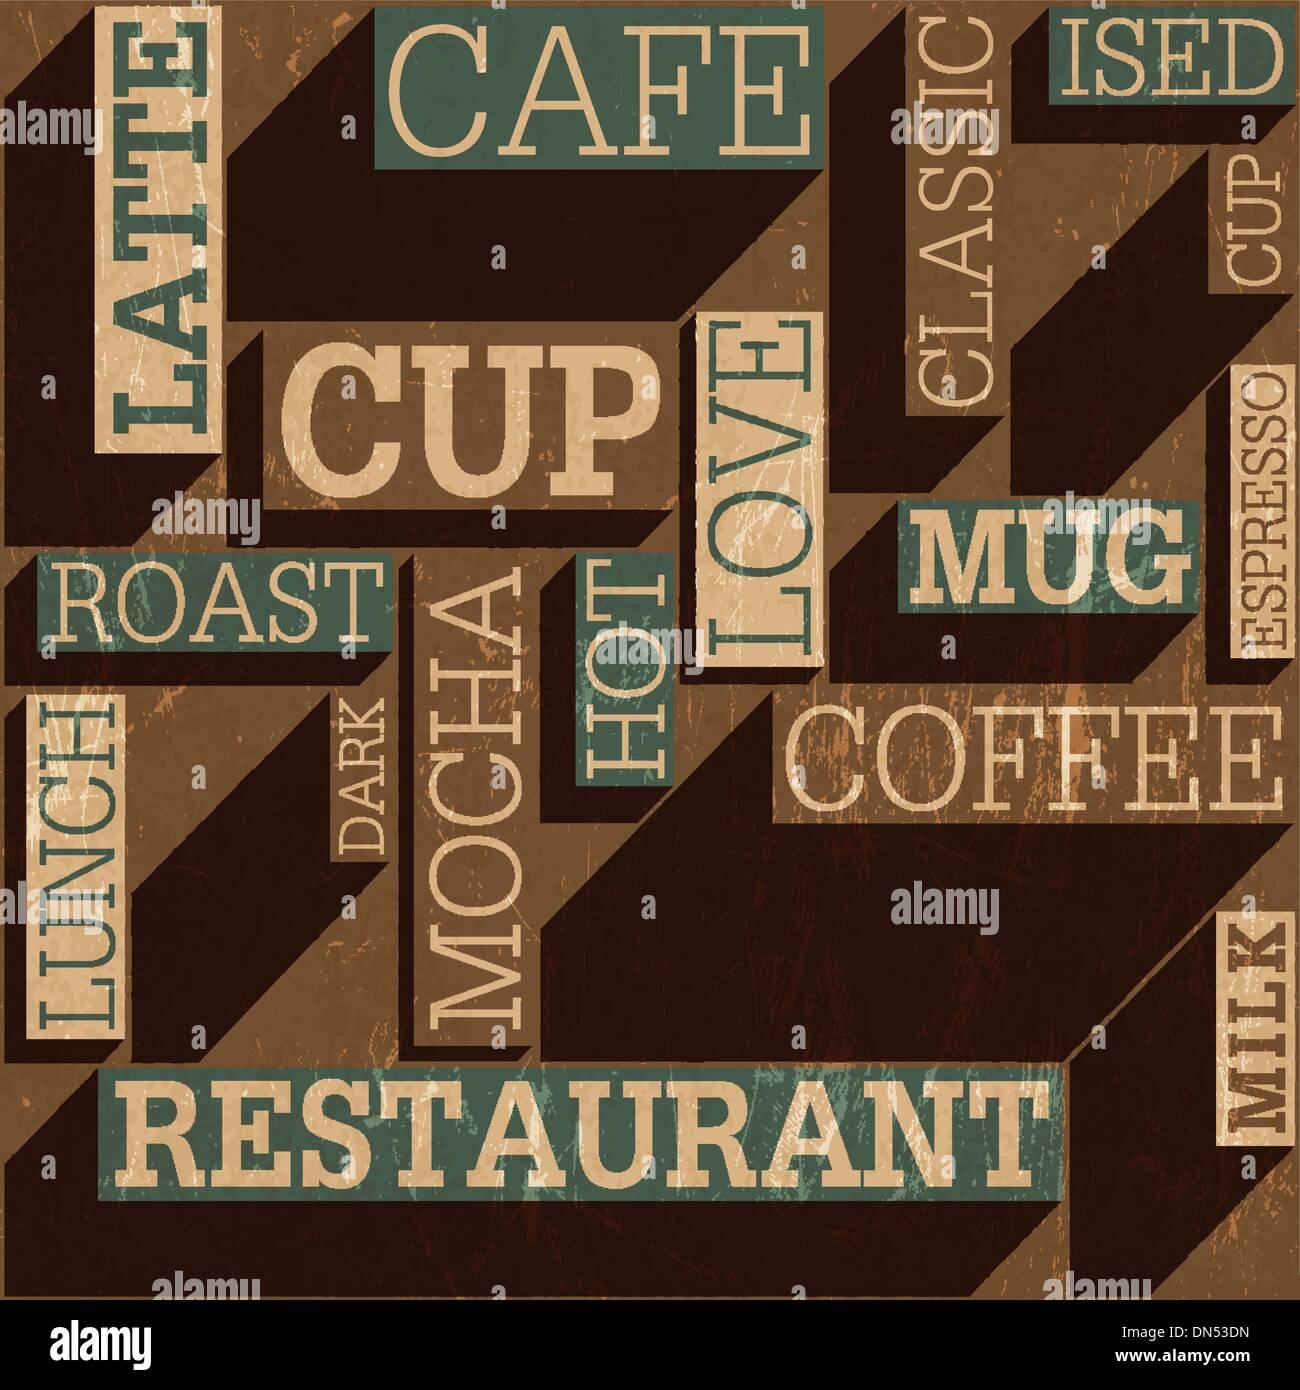 Kaffee unter dem Motto nahtlose Retro-Hintergrund, Vektor Stock Vektor